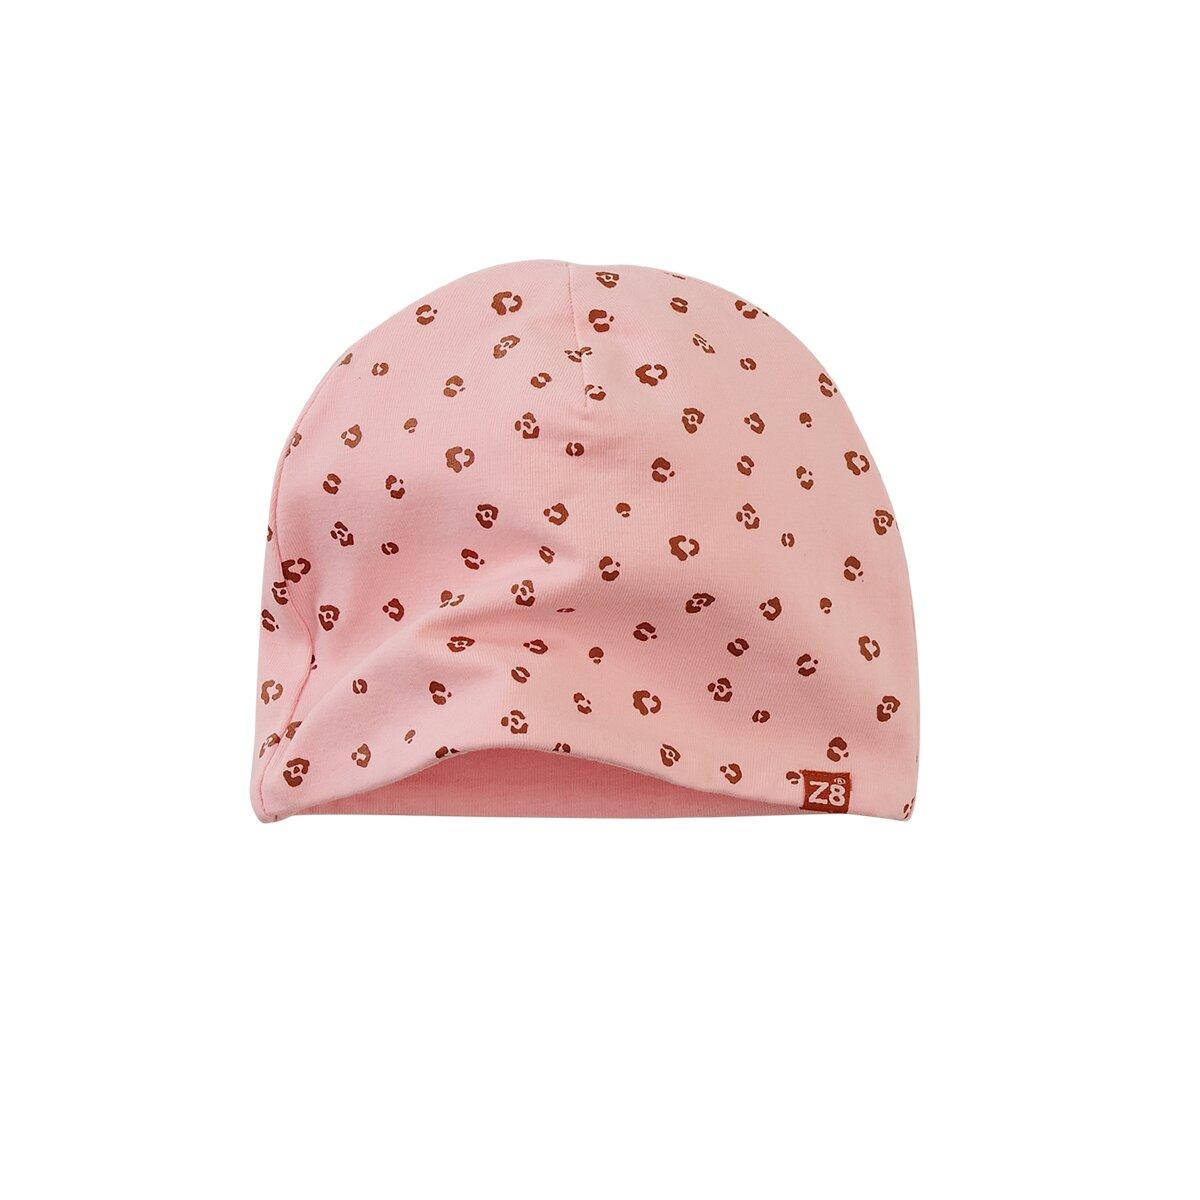 z8-newbornw20210043rochester-soft-pink-02